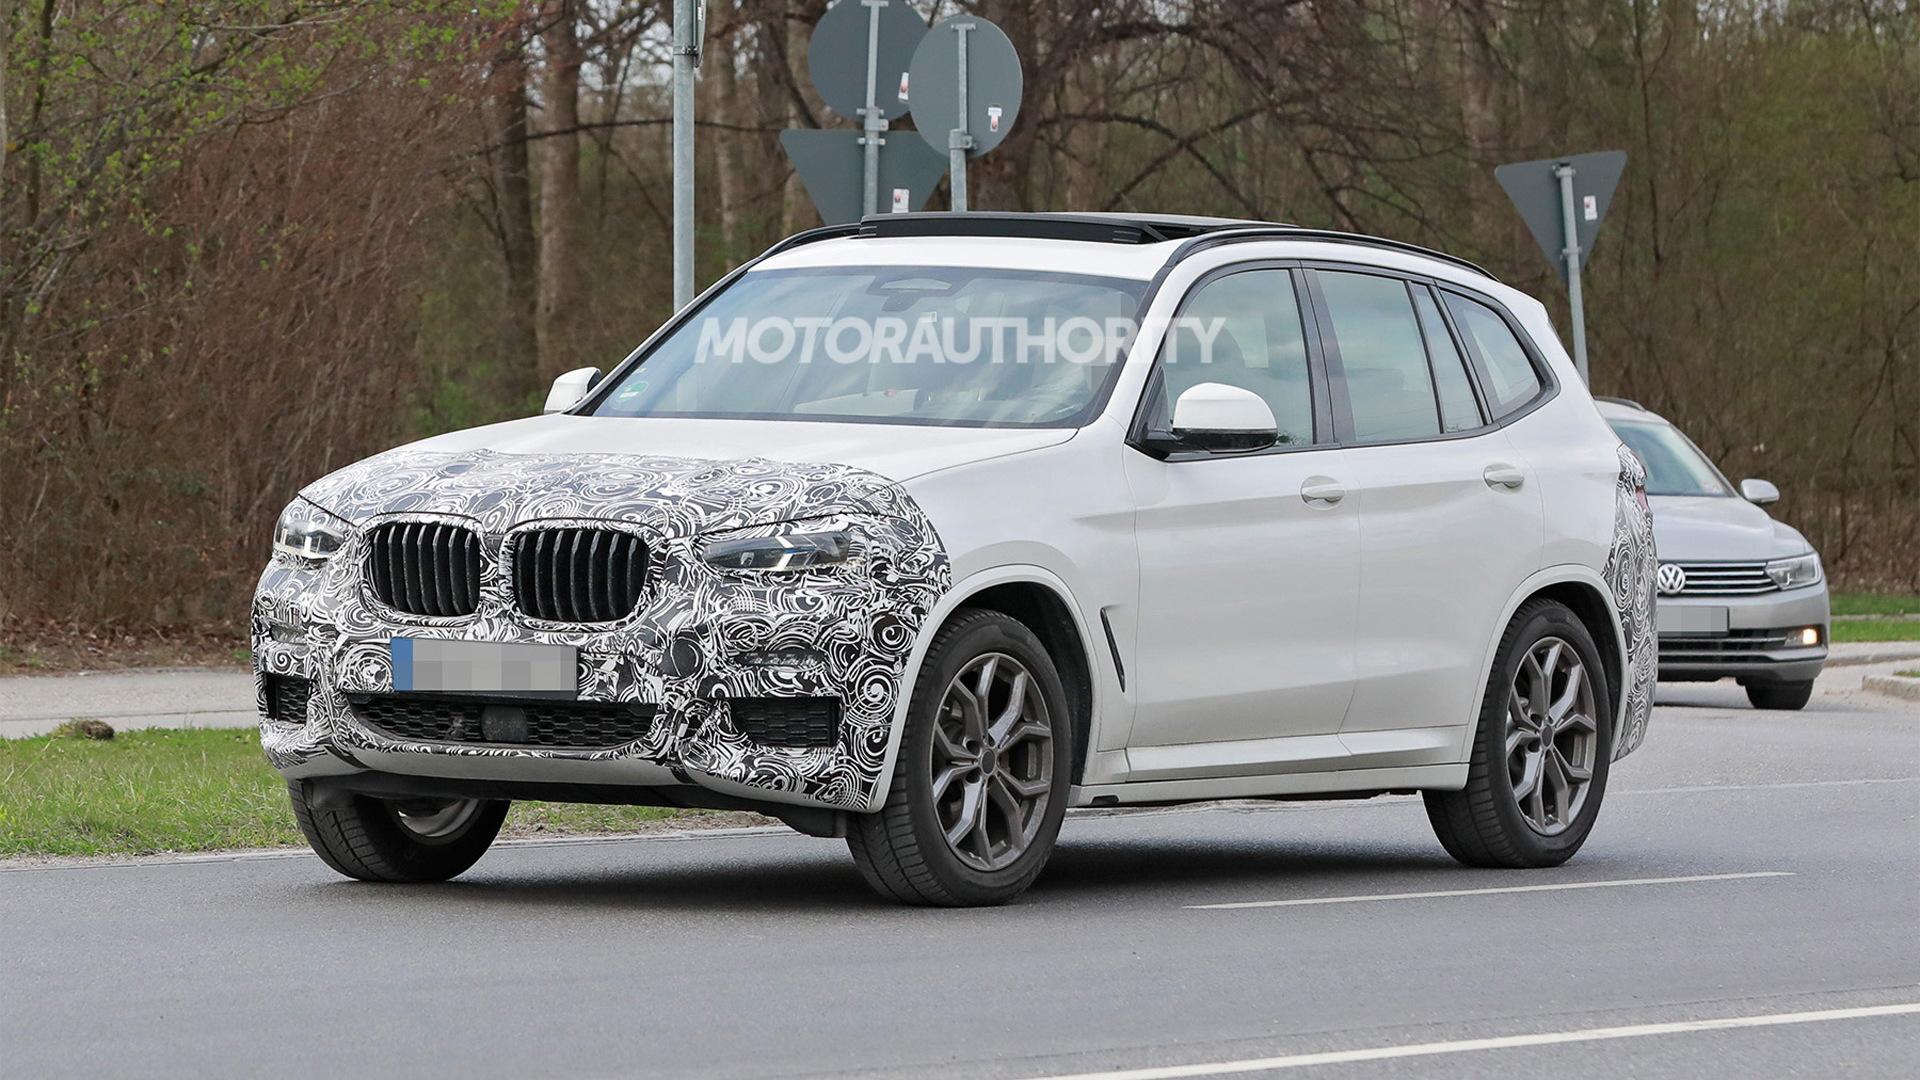 2022 BMW X3 facelift spy shots - Photo credit: S. Baldauf/SB-Medien